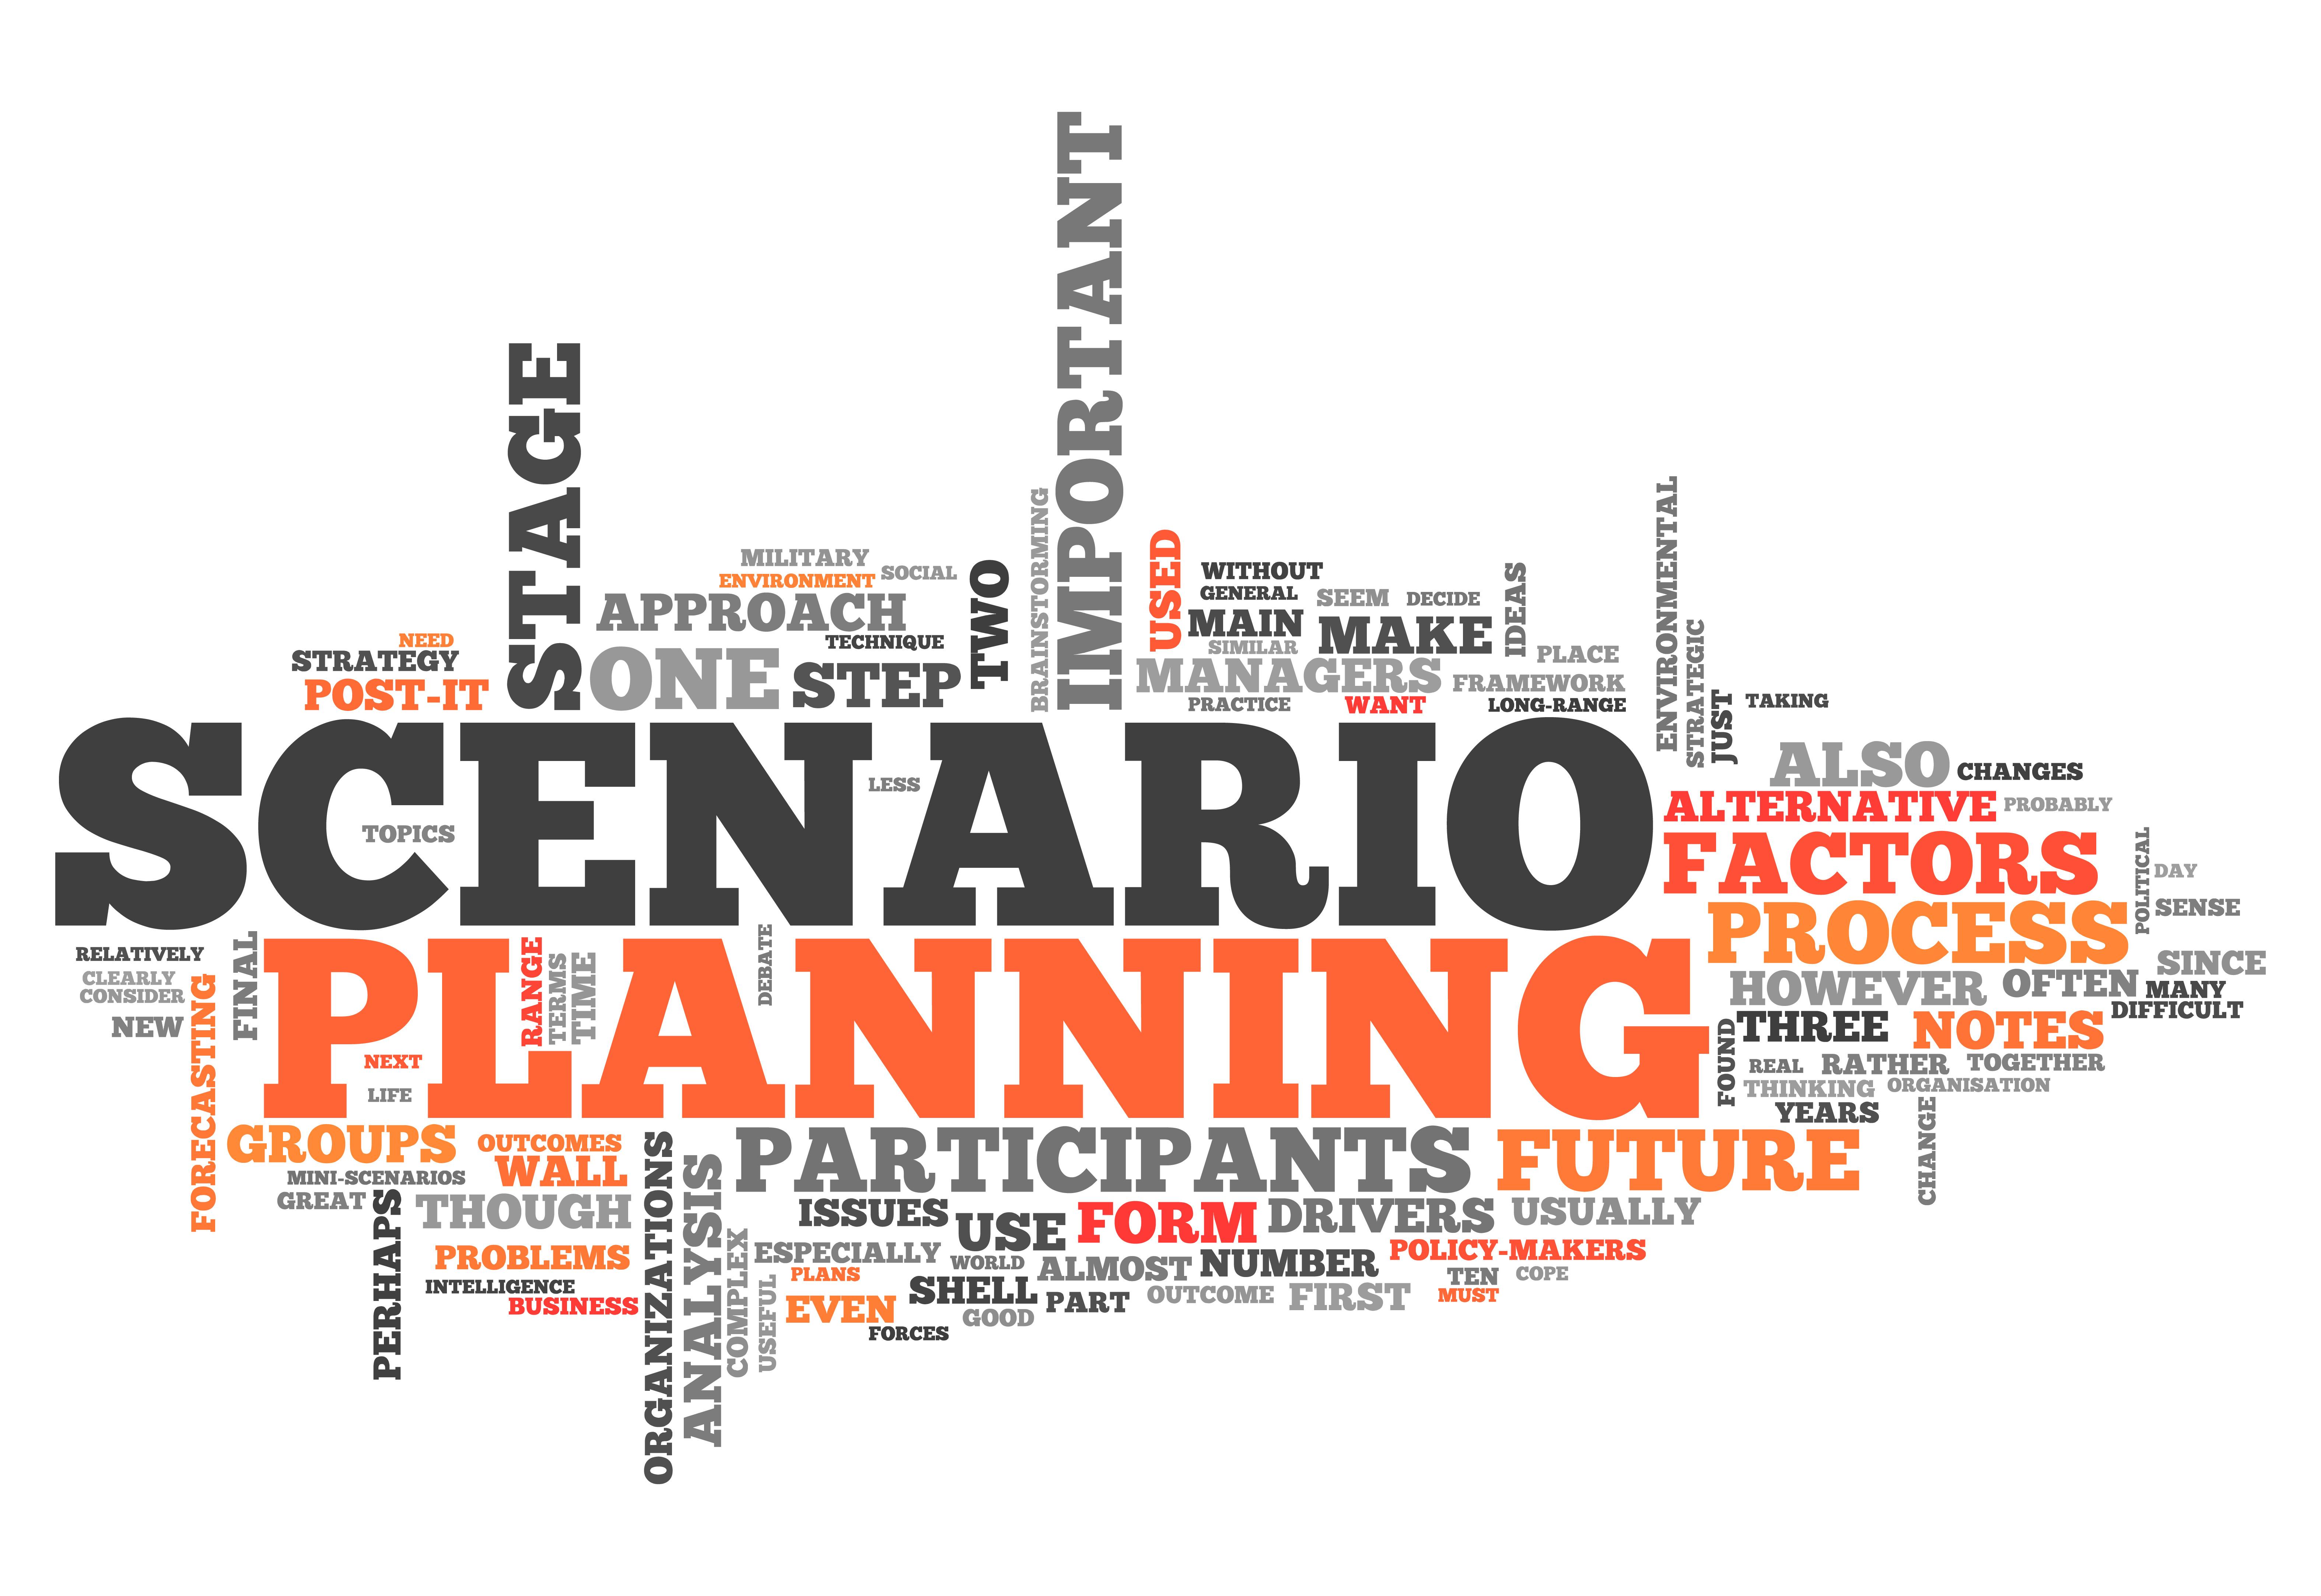 Workforce Scenarios